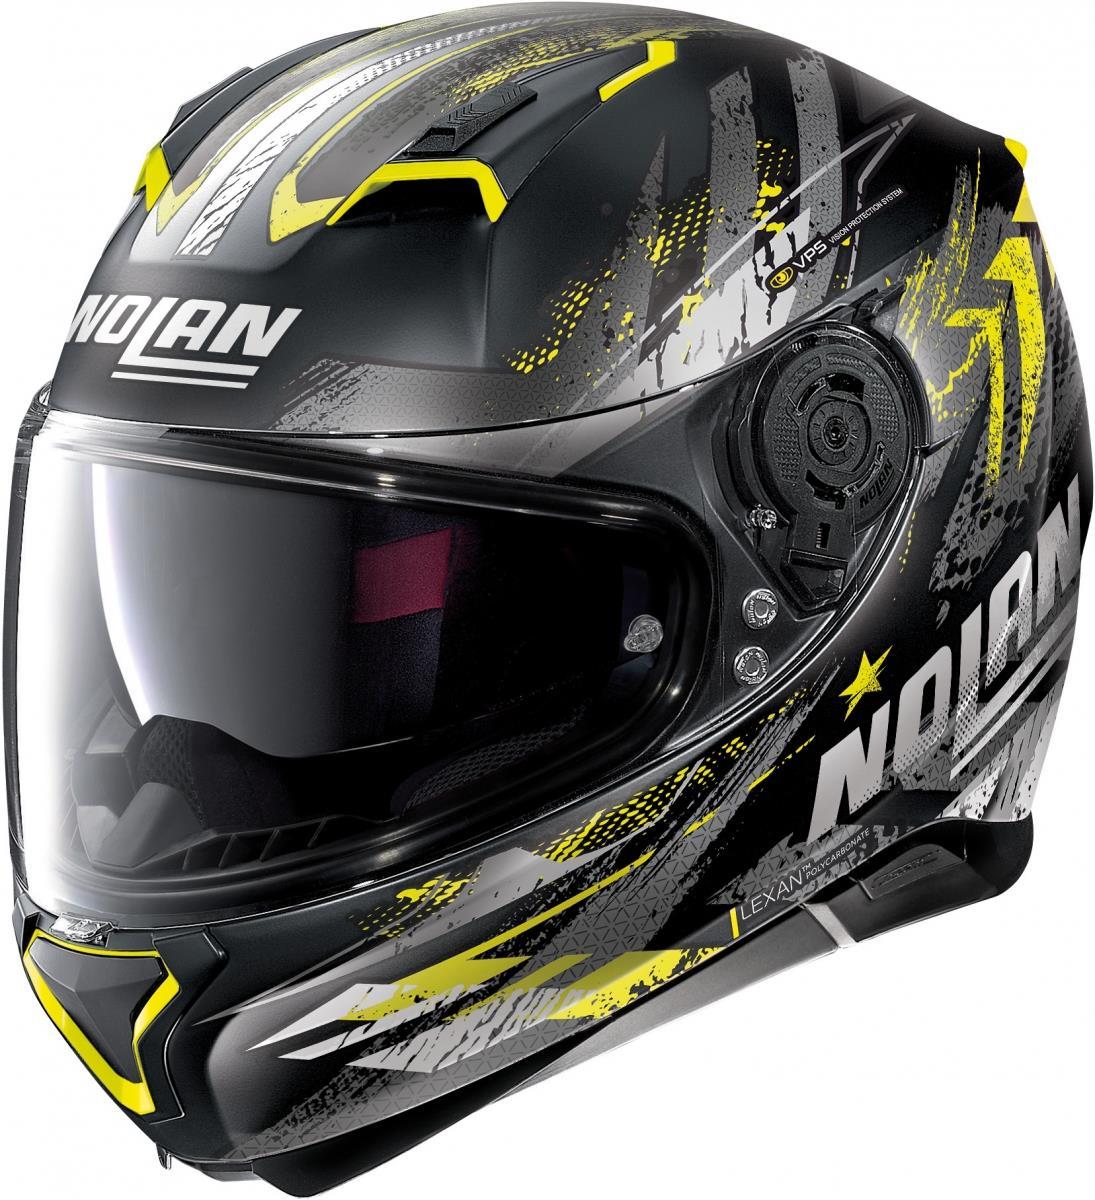 Nolan N87 Carnival motorhelm